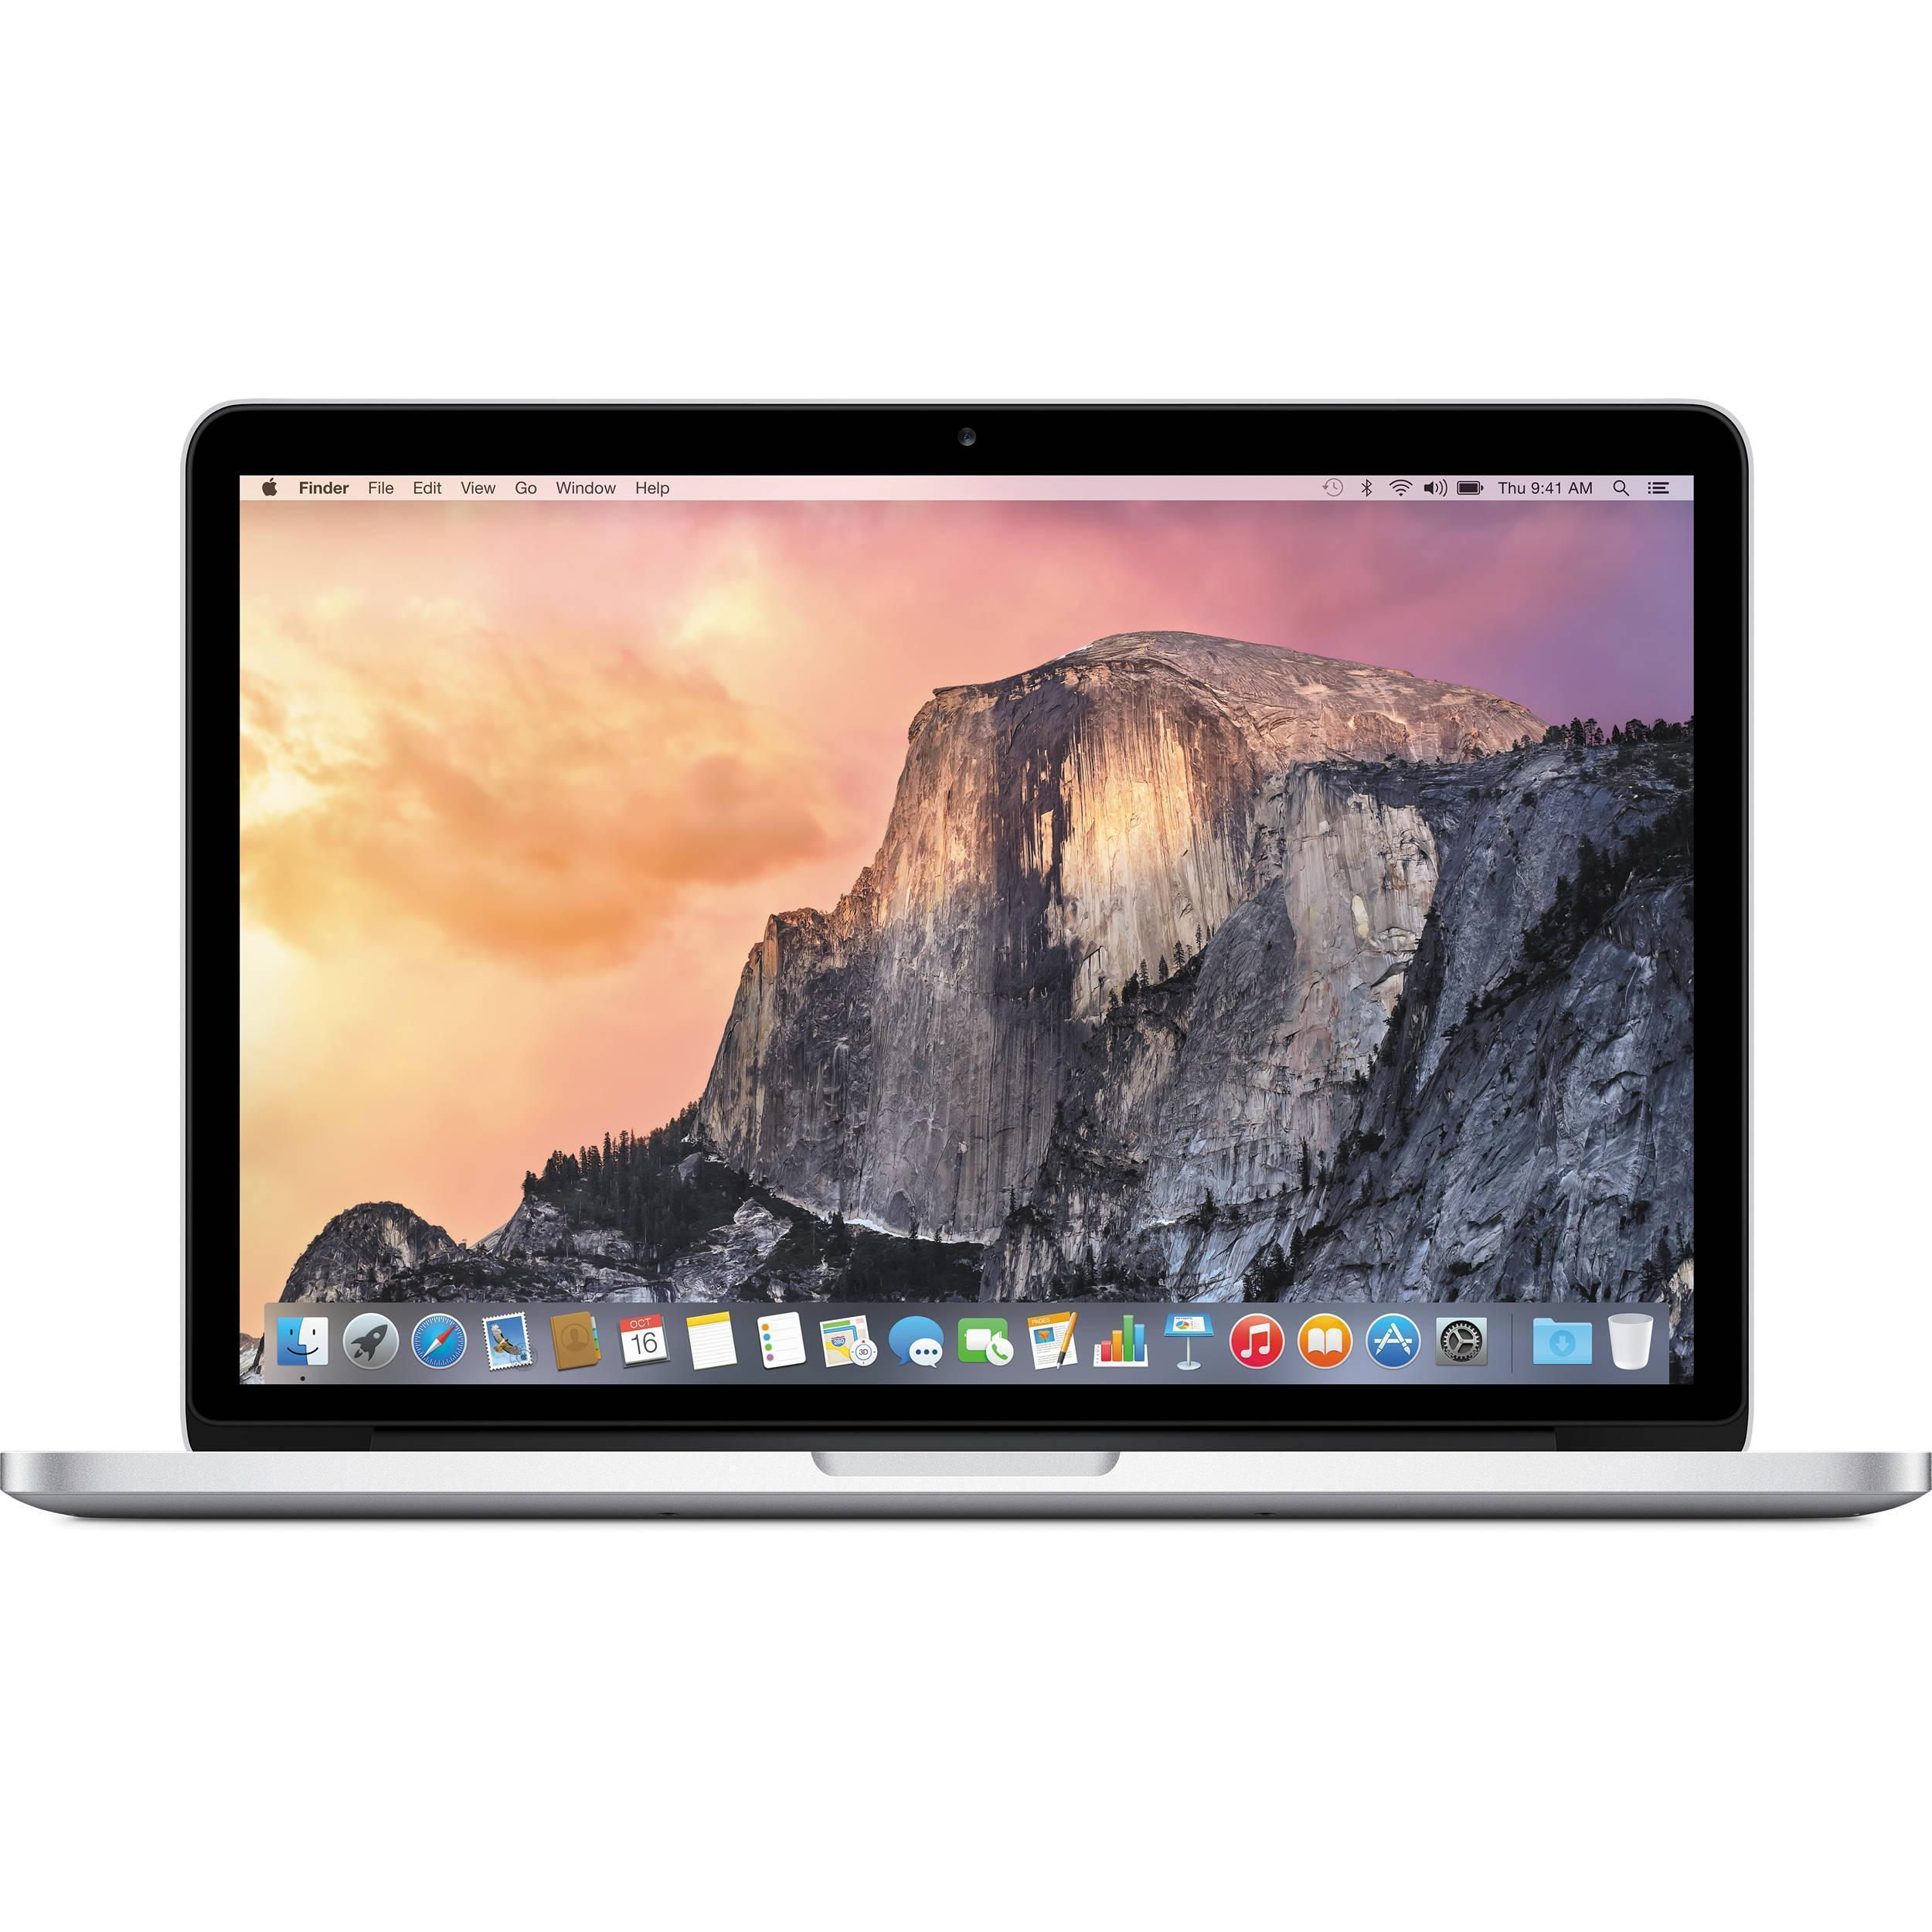 MacBook Pro Retina 13.3-inch (2015) - Core i5 - 8GB - SSD 128 GB